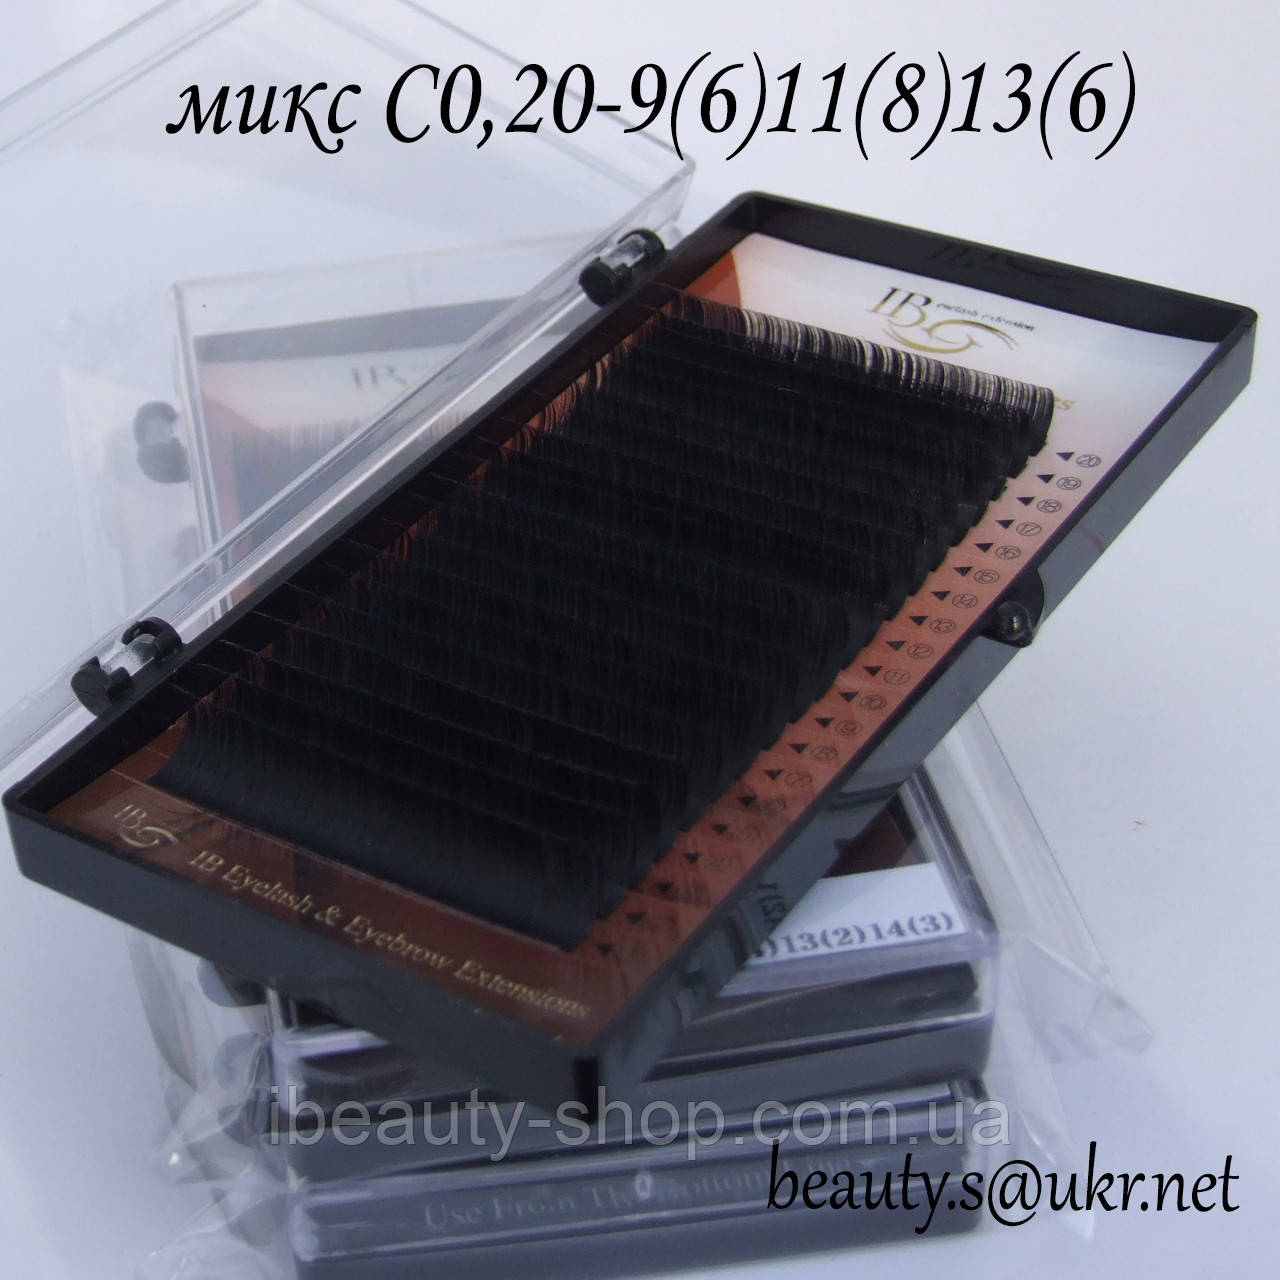 Ресницы I-Beauty микс С-0,20 9-11-13мм